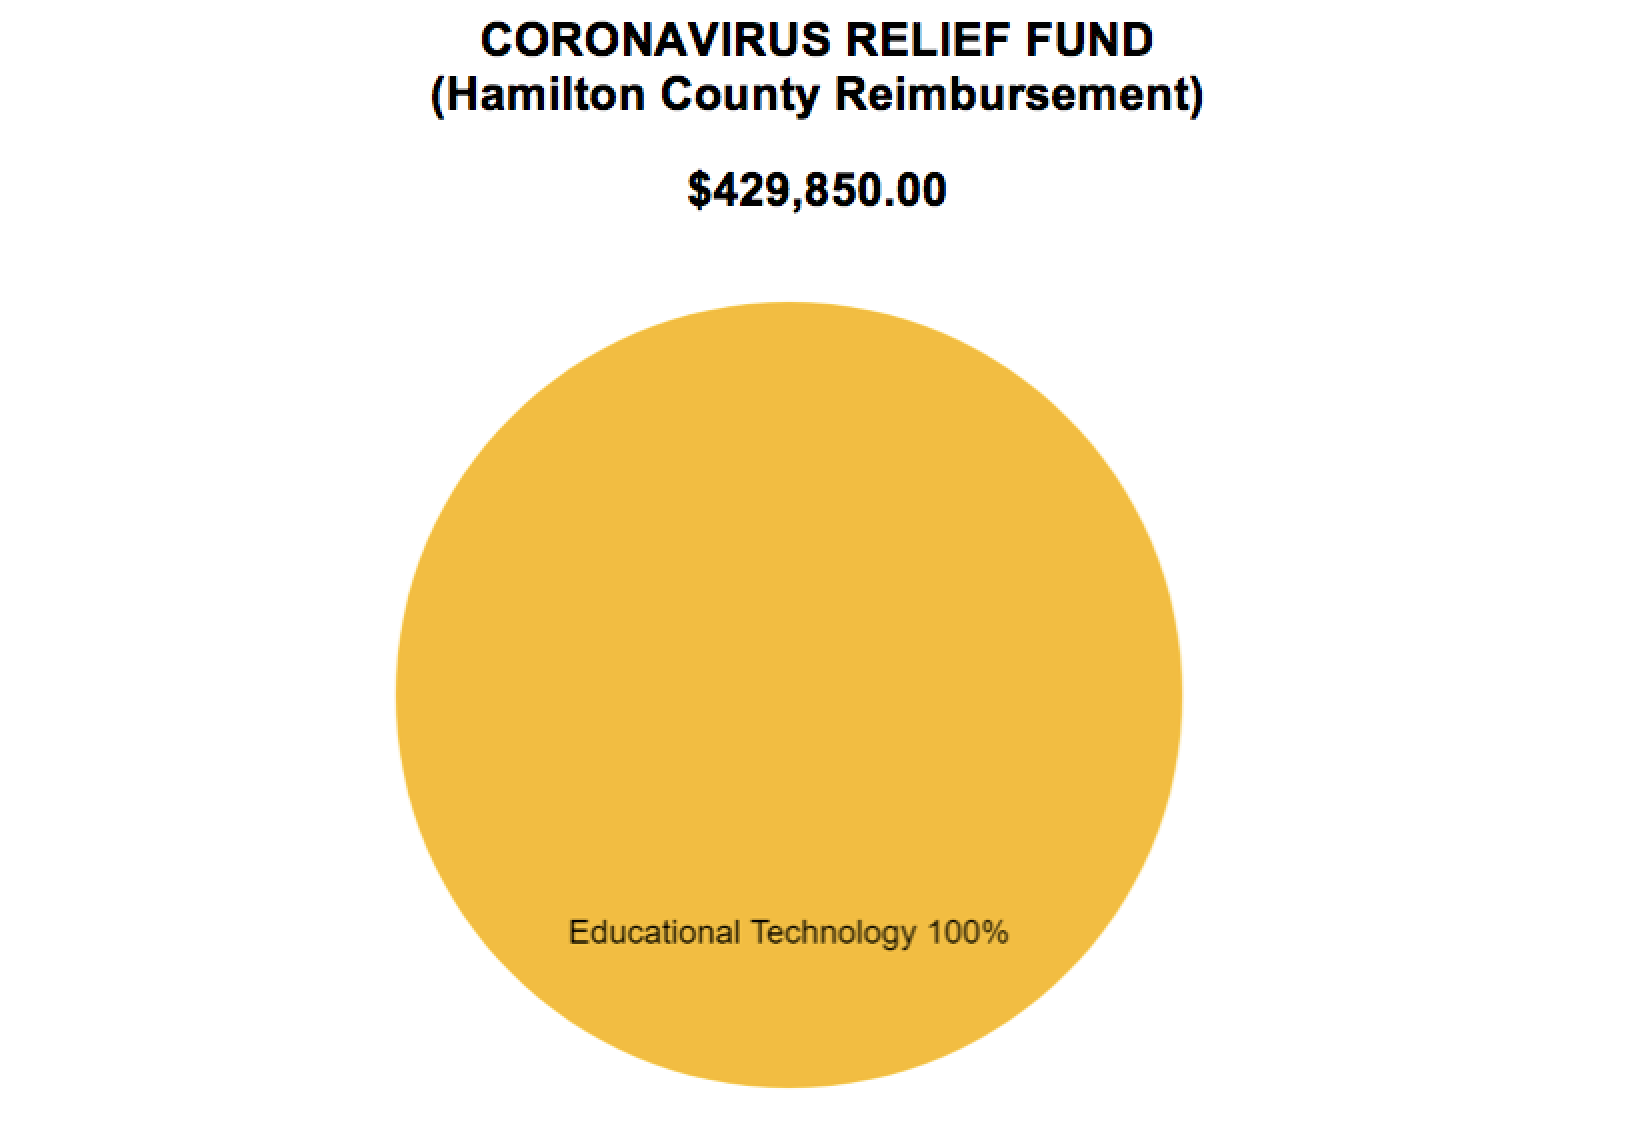 CORONAVIRUS RELIEF FUND HAMILTON COUNTY REIMBURSEMENT $429,850.00